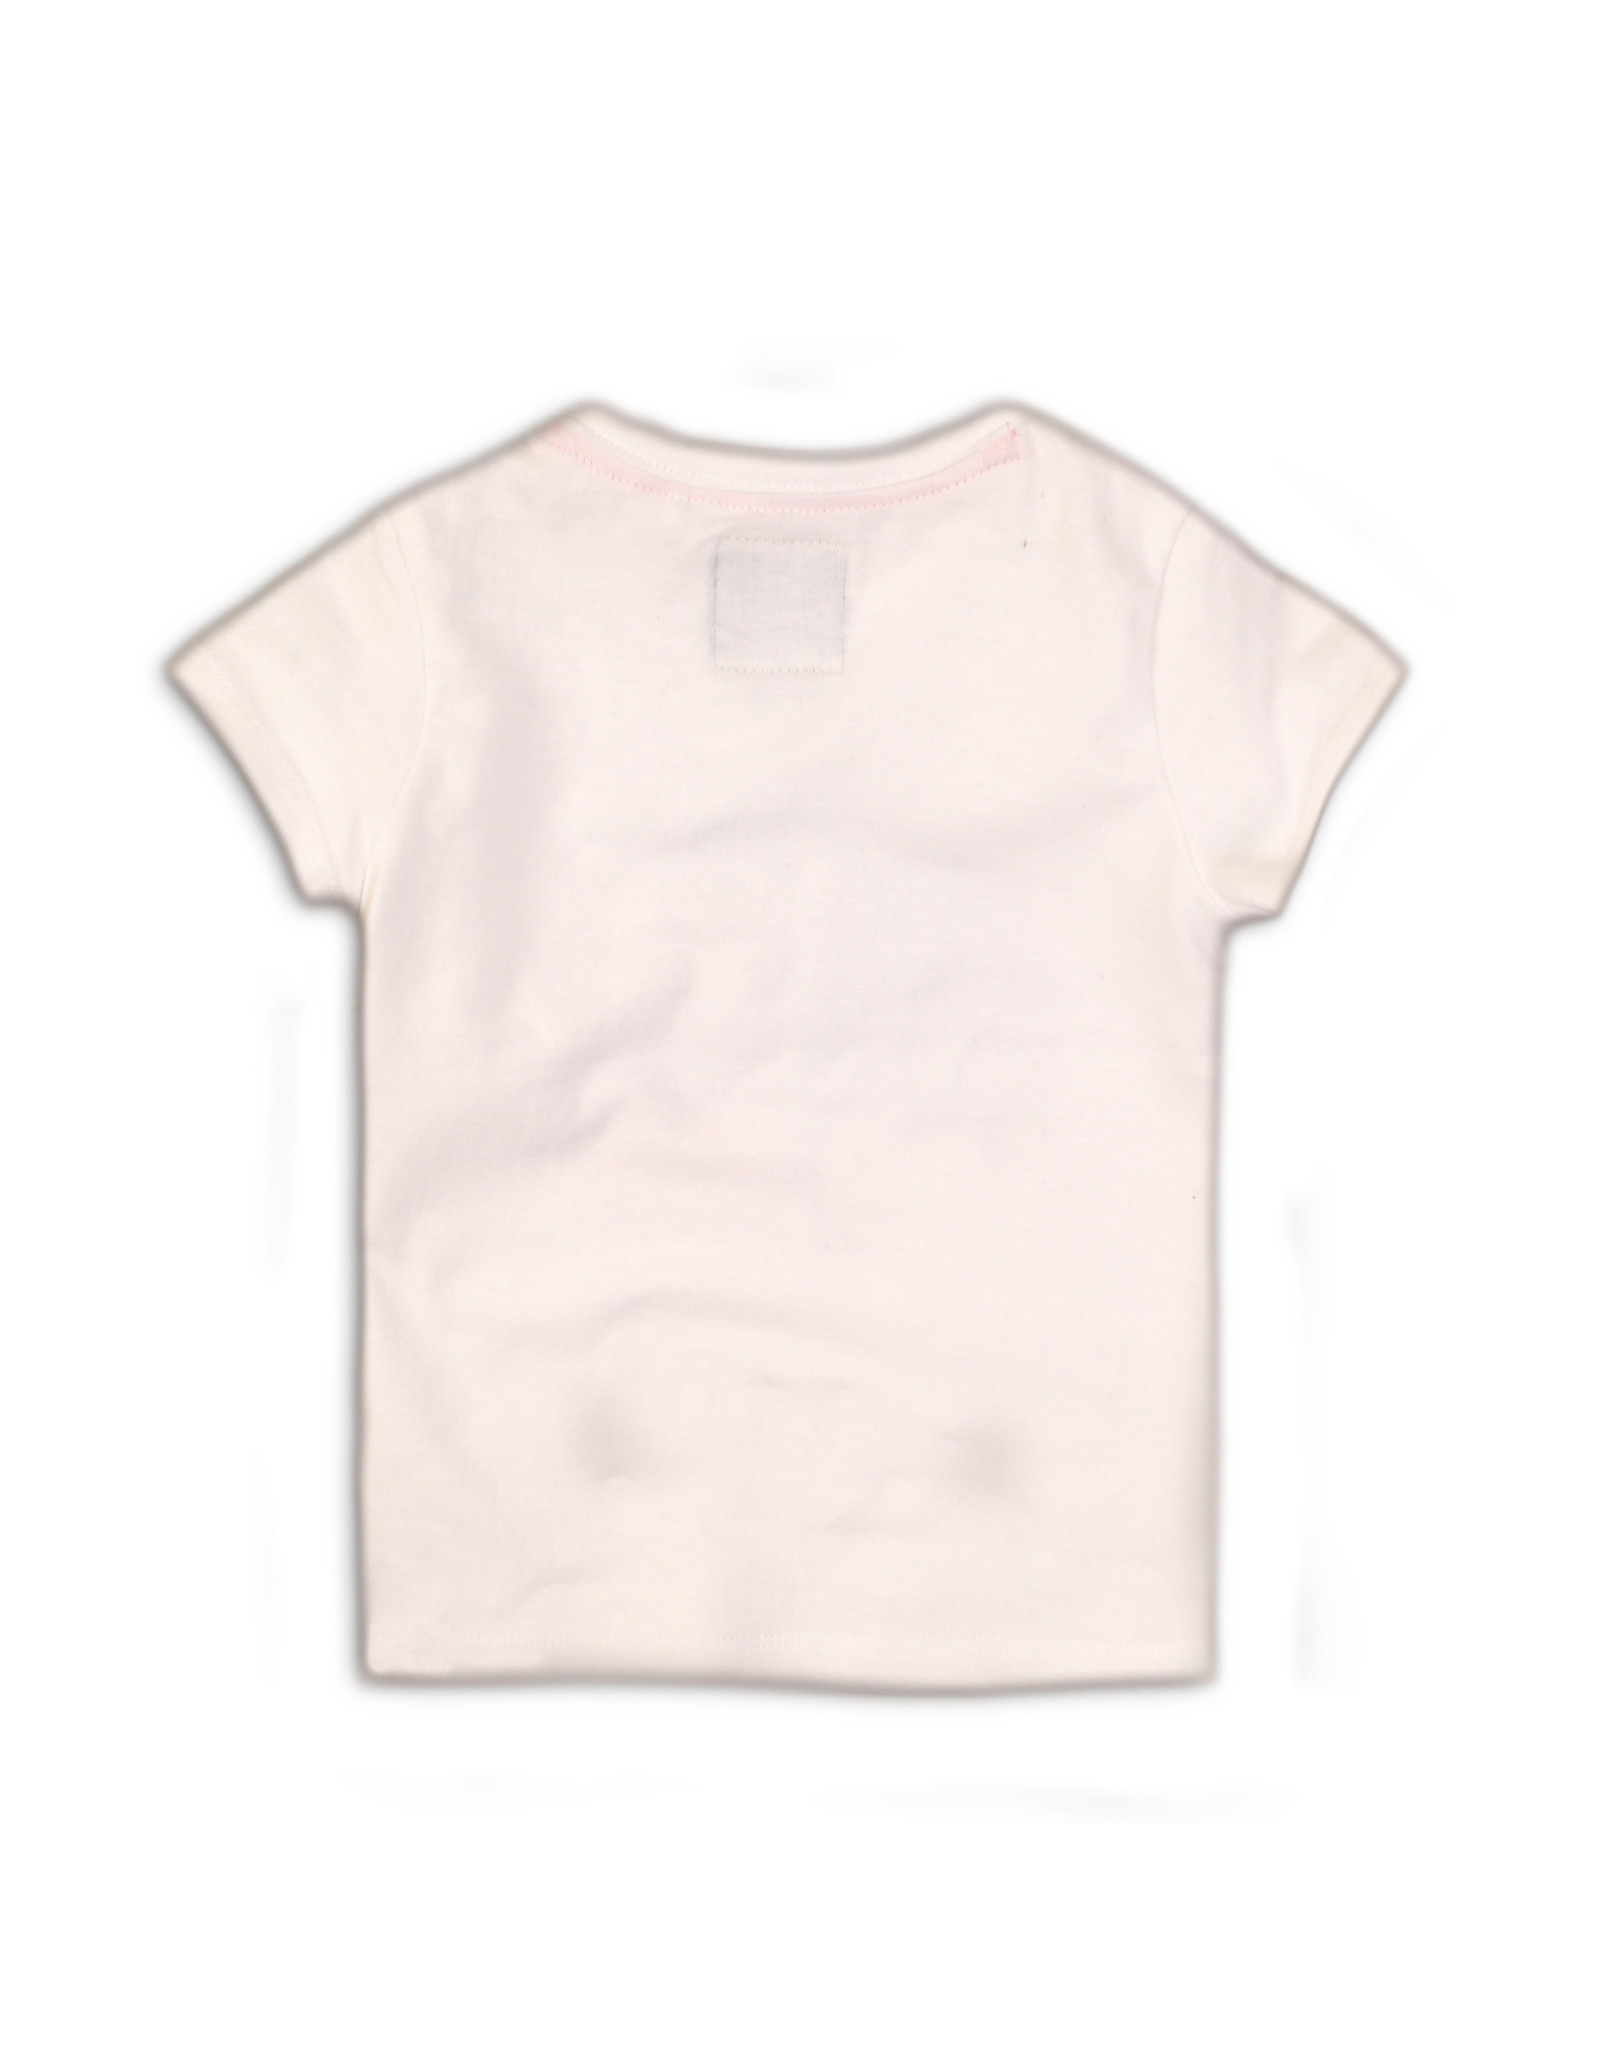 Koko Noko Koko Noko meisjes t-shirt Beach